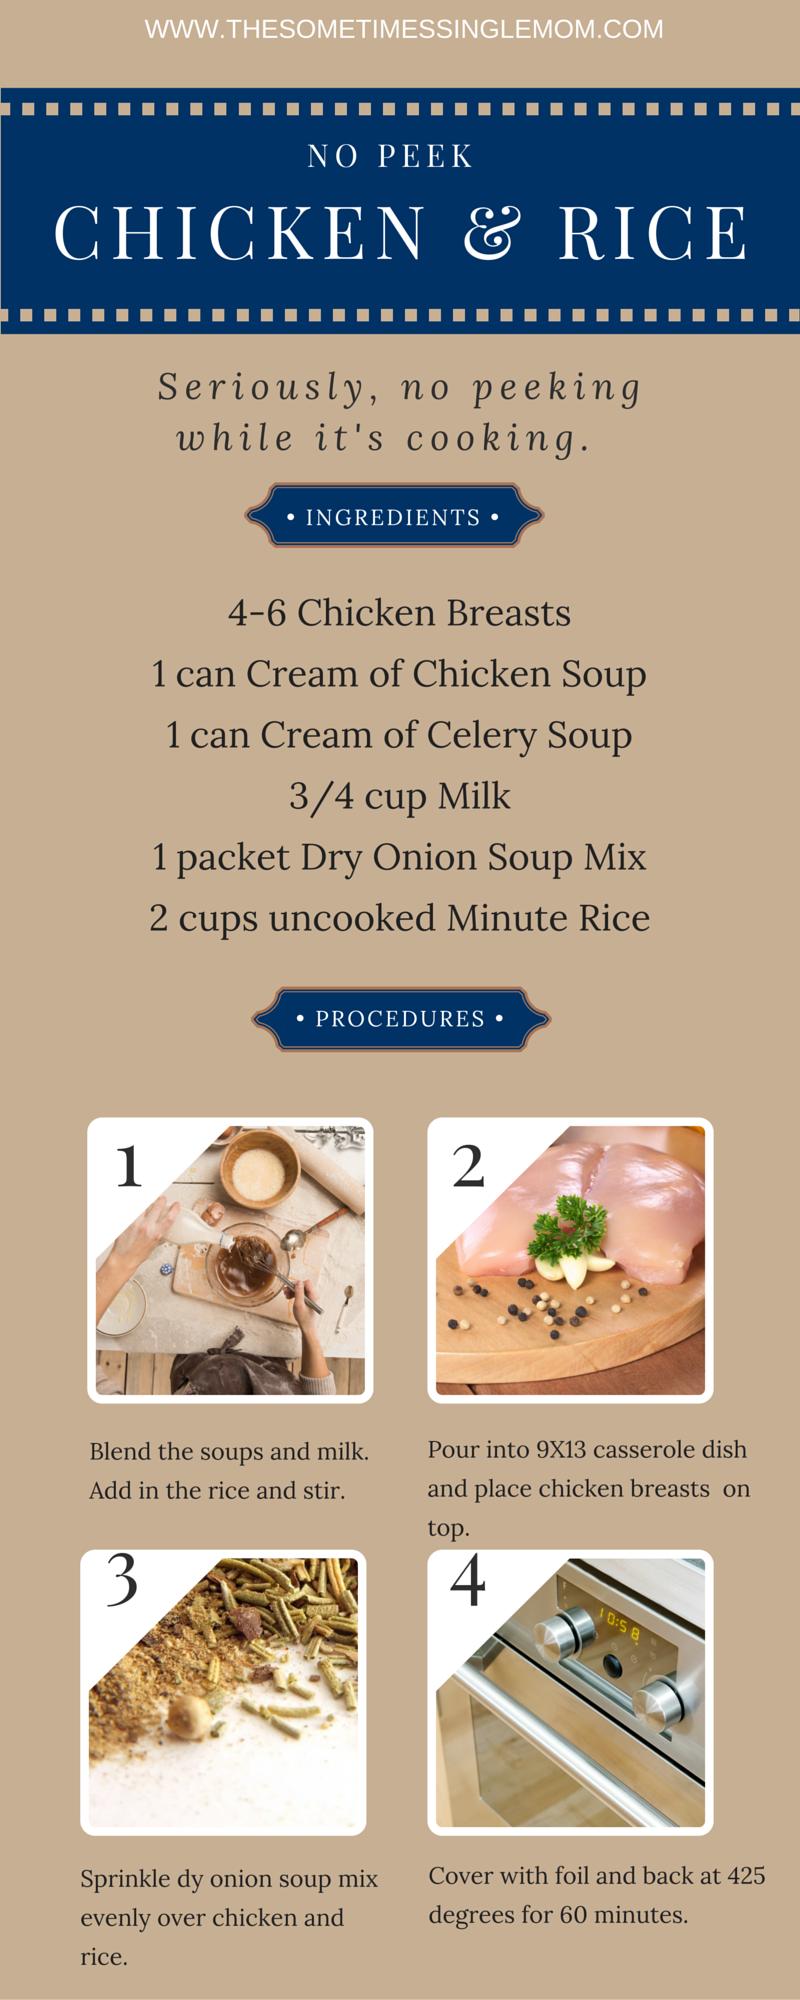 No_peek_chicken_rice